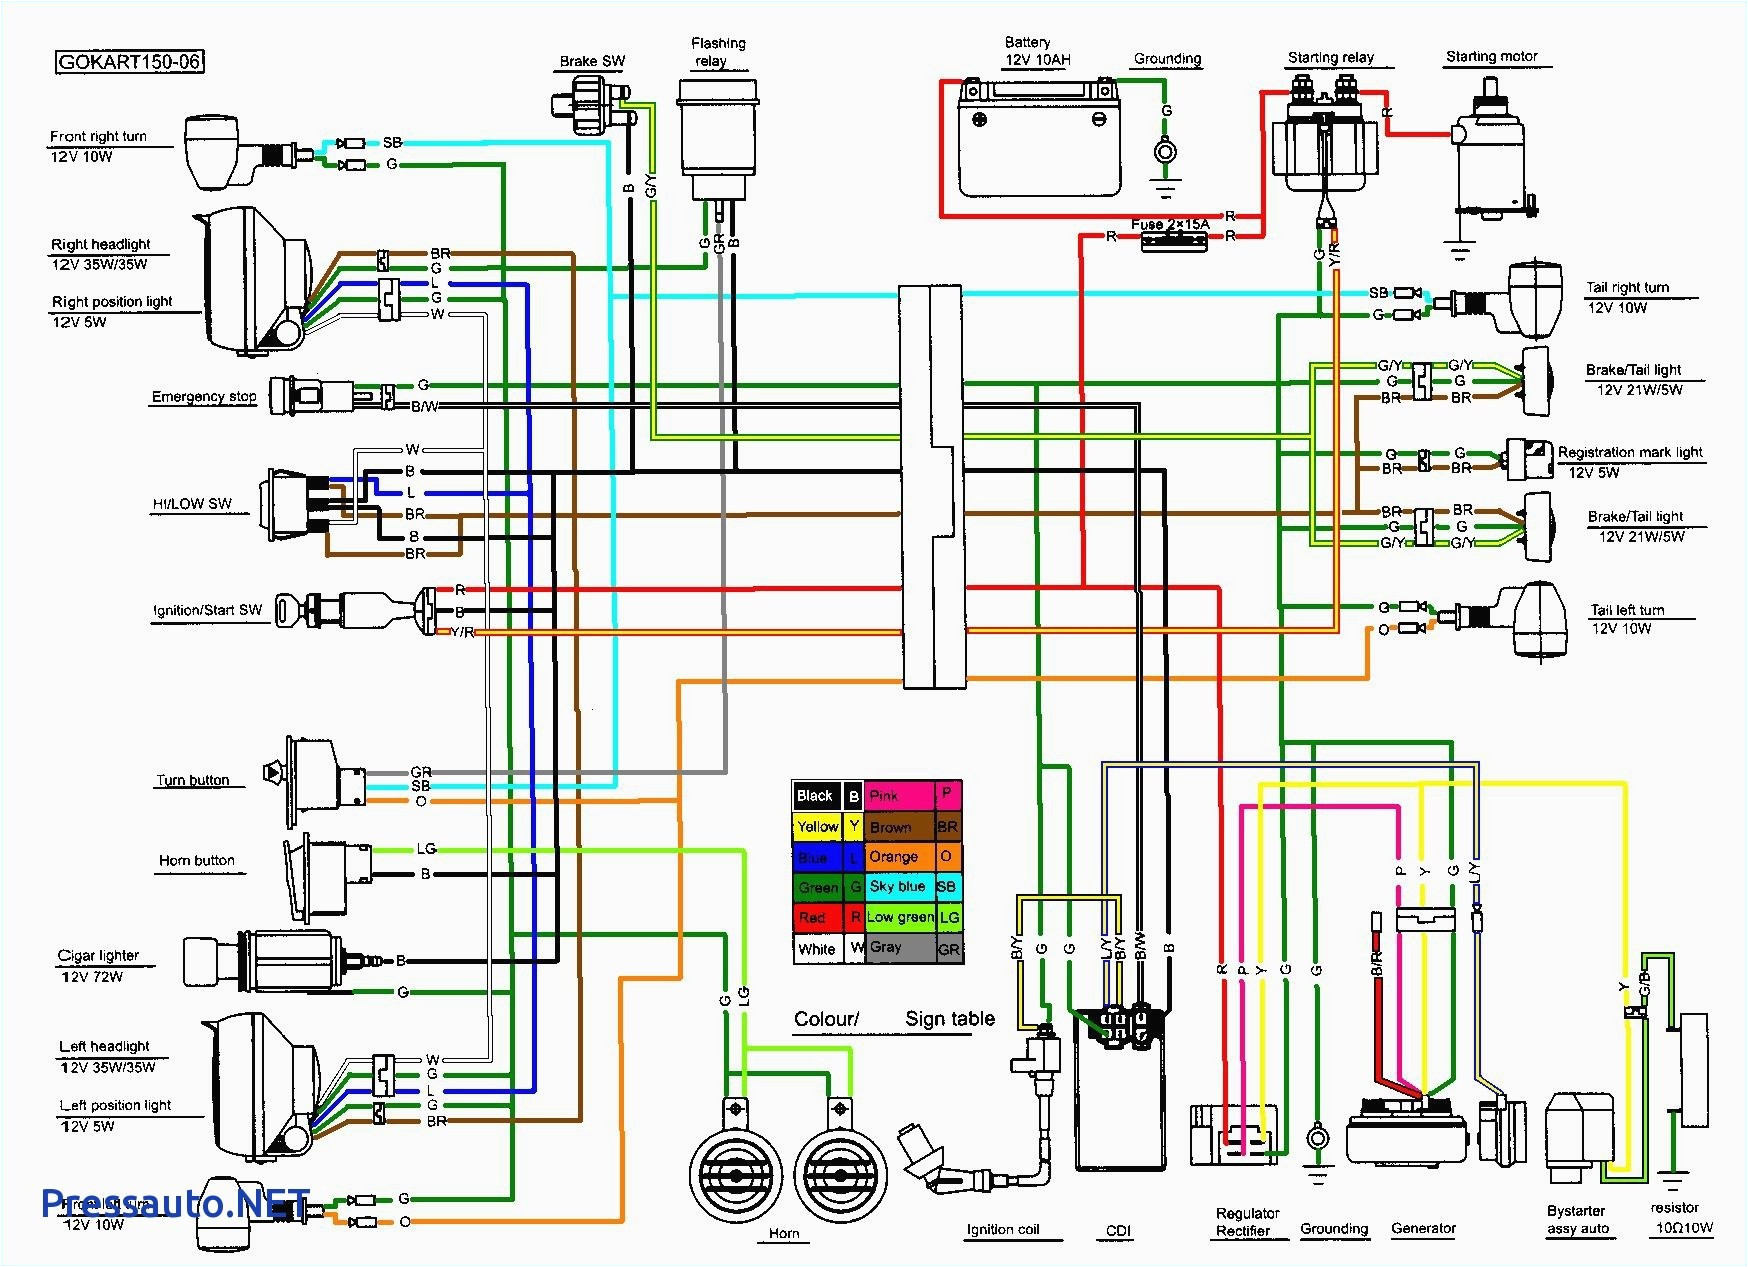 sony atv wiring wiring diagrams for sony atv wiring